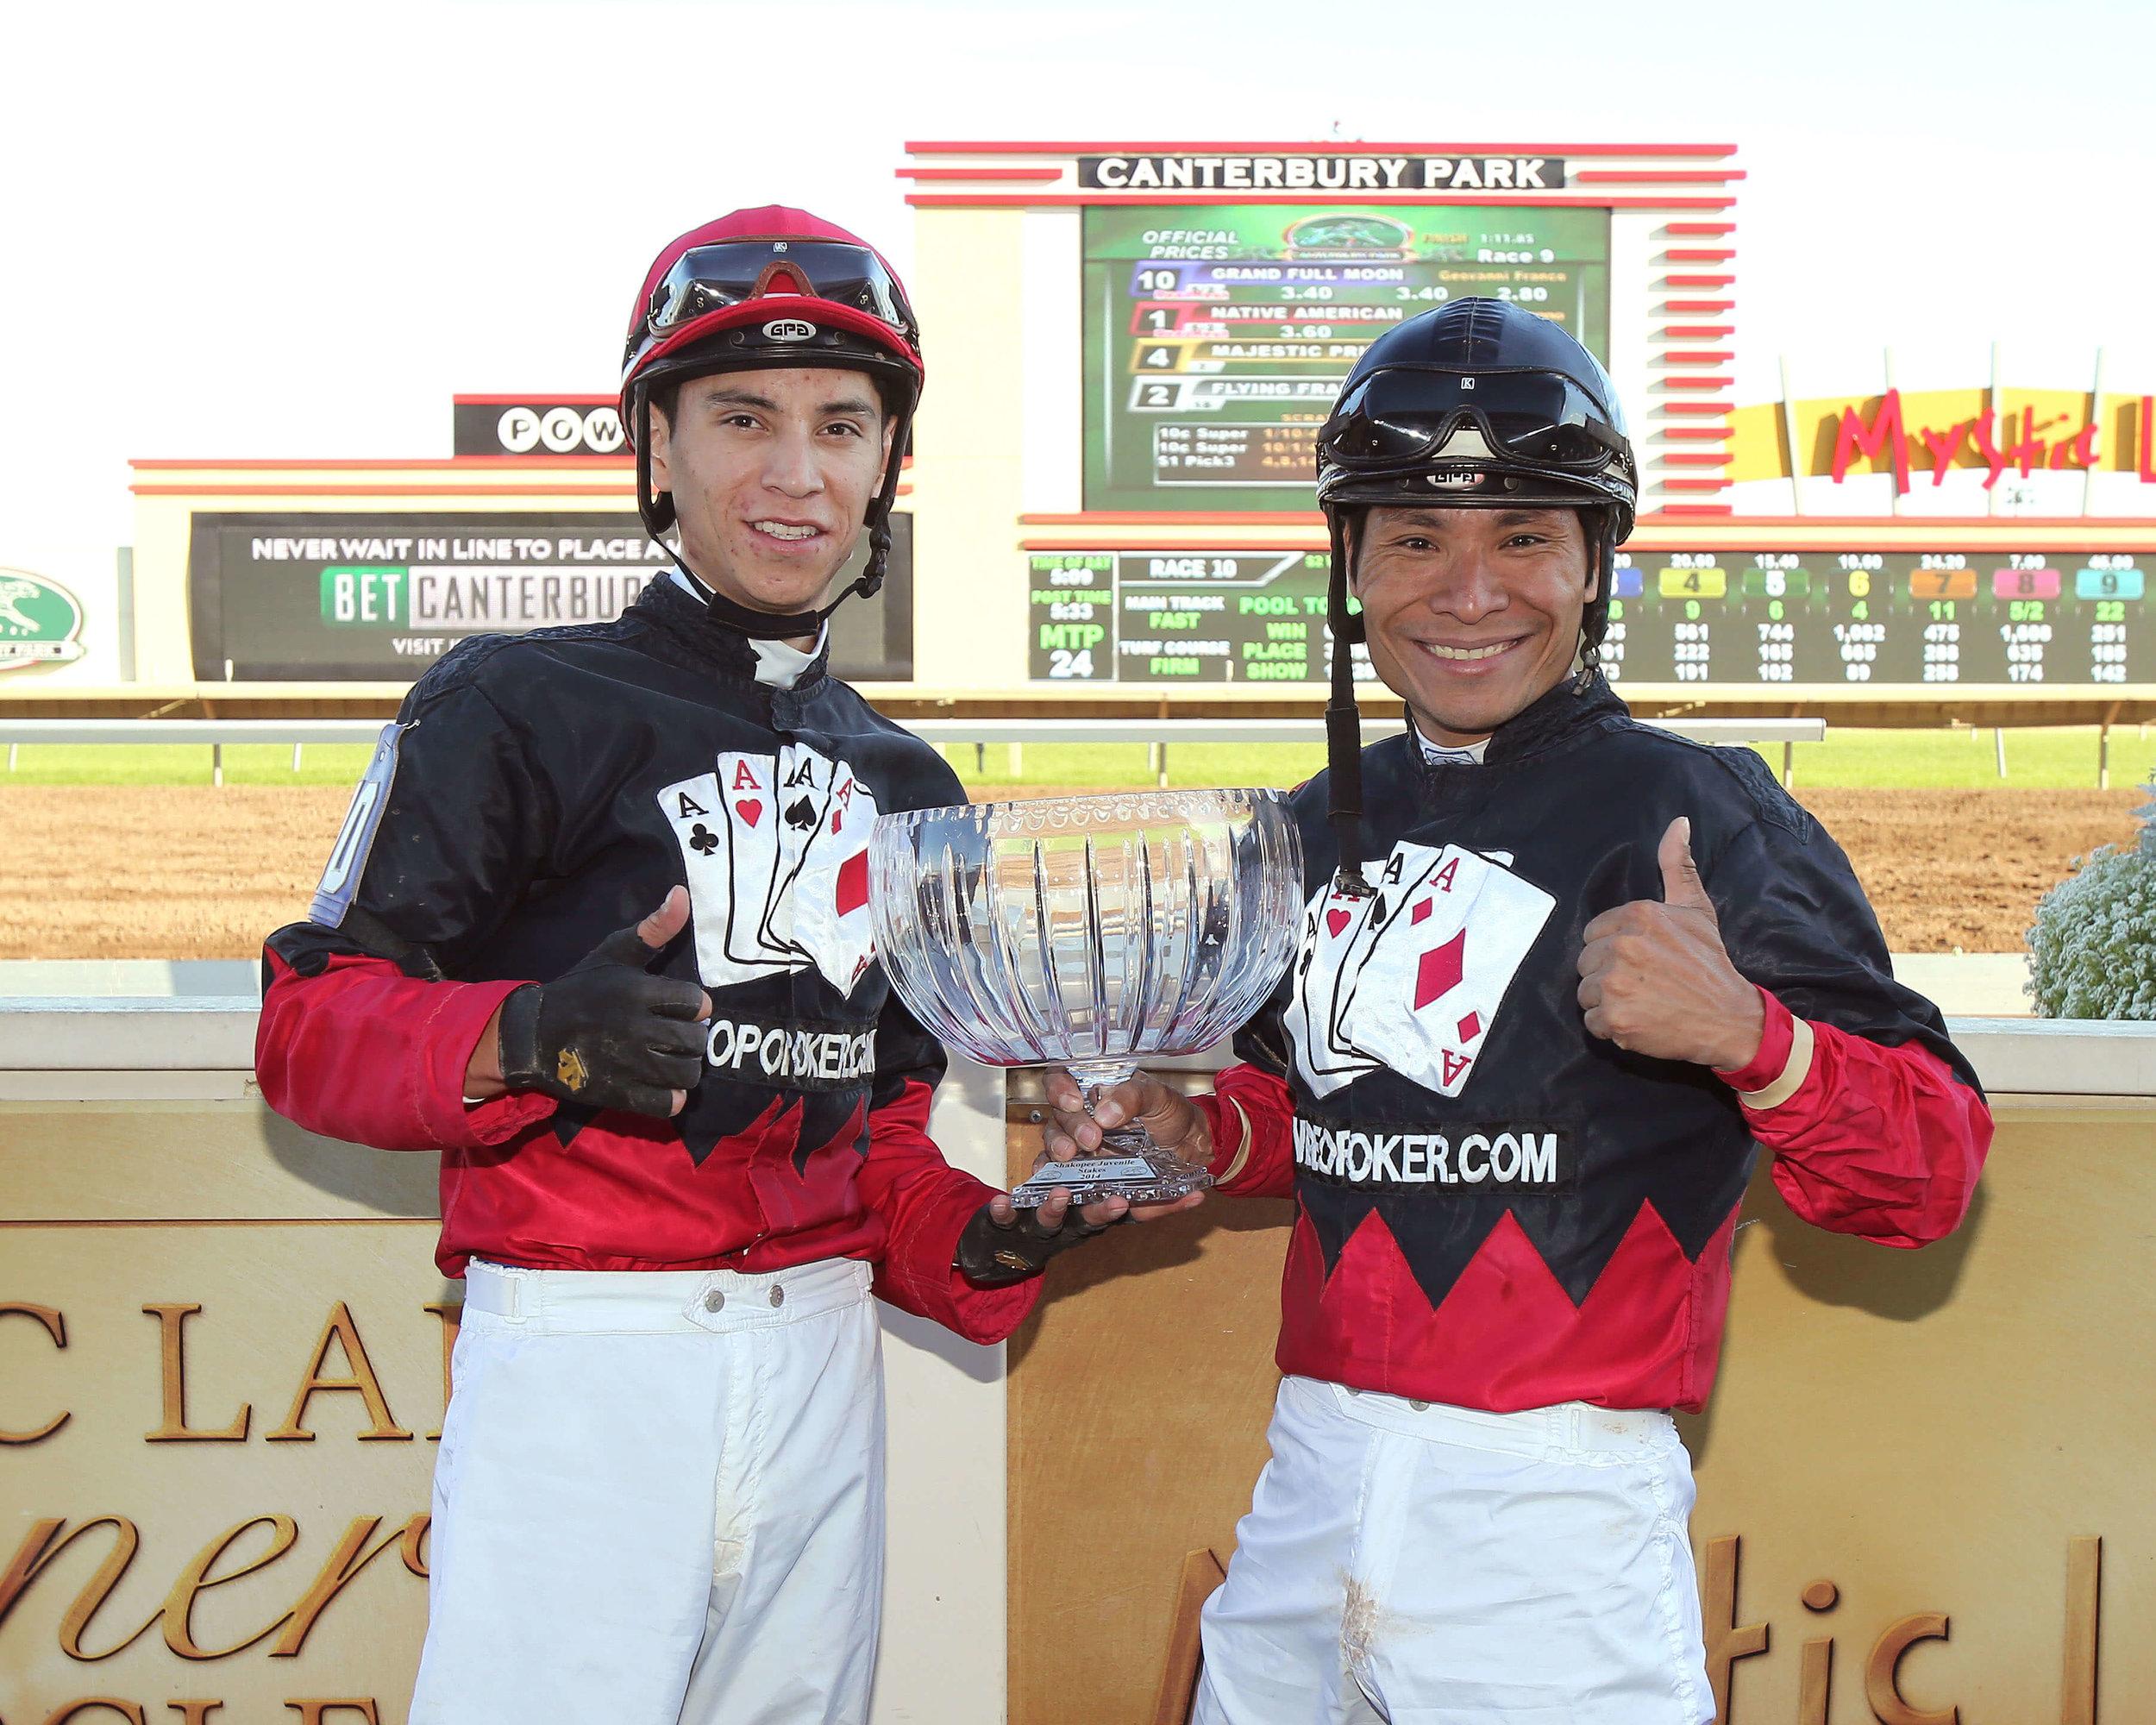 Native American & Grand Full Moon (DH) - Shakopee Juvenile Stakes - 09-13-14 - R09 - CBY - Pres2 (1).jpg